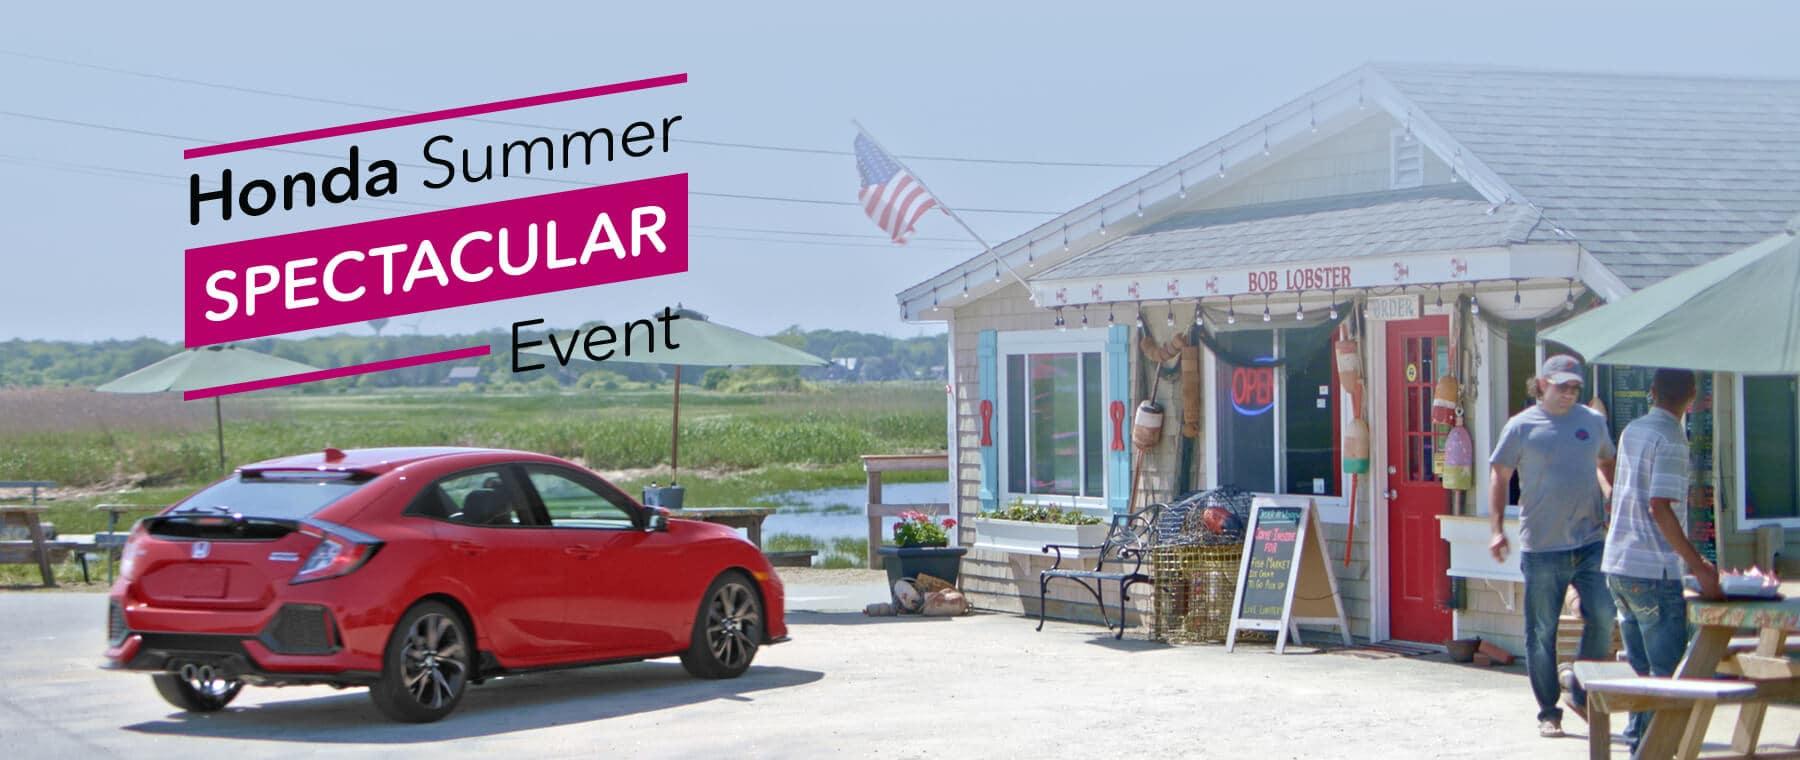 New England Honda Summer Spectacular Event